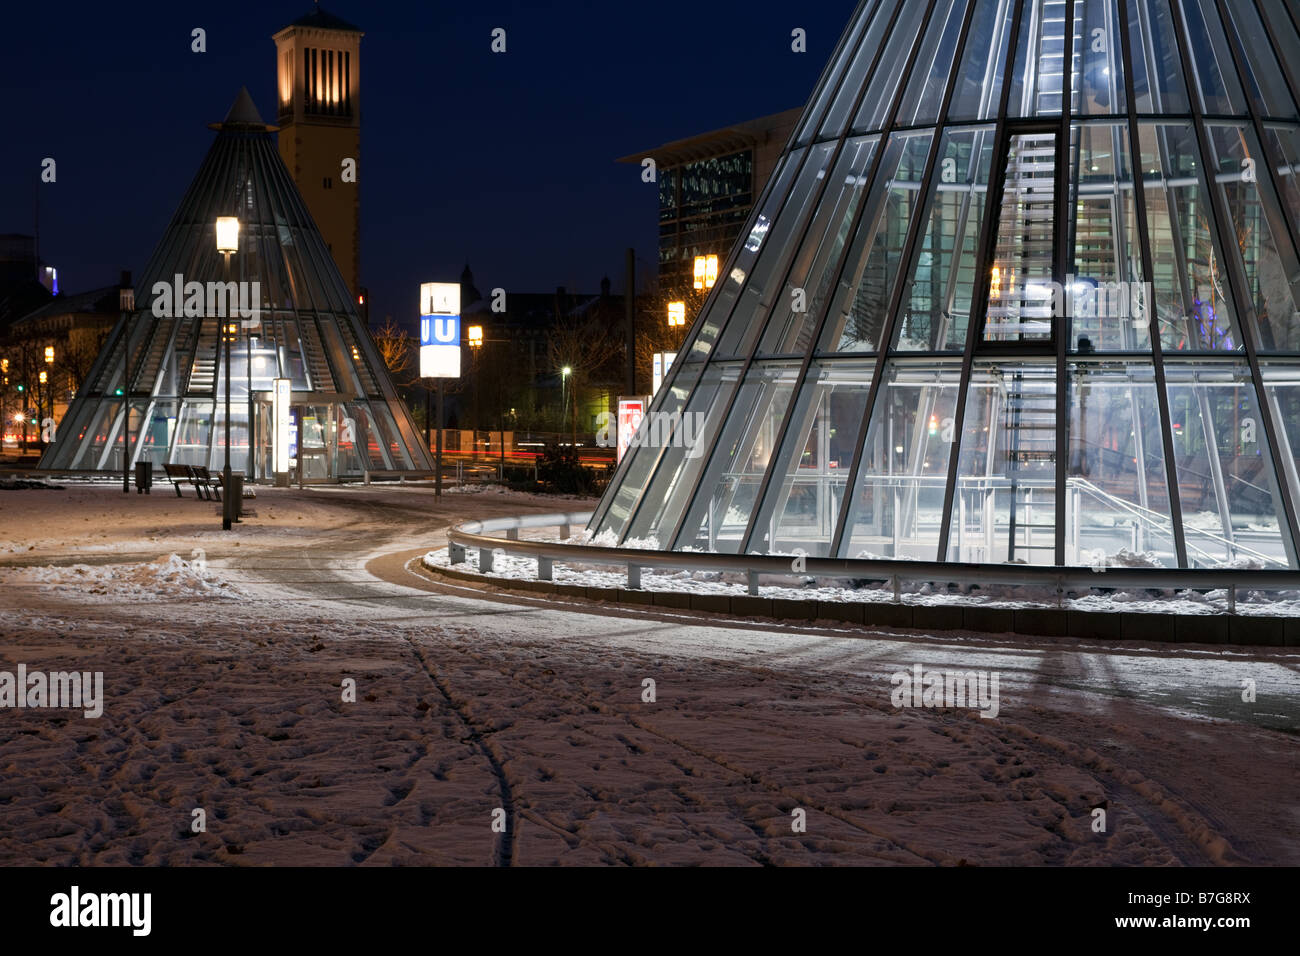 The entrance to Frankfurt s Festhalle Messe U Bahn Station Stock Photo